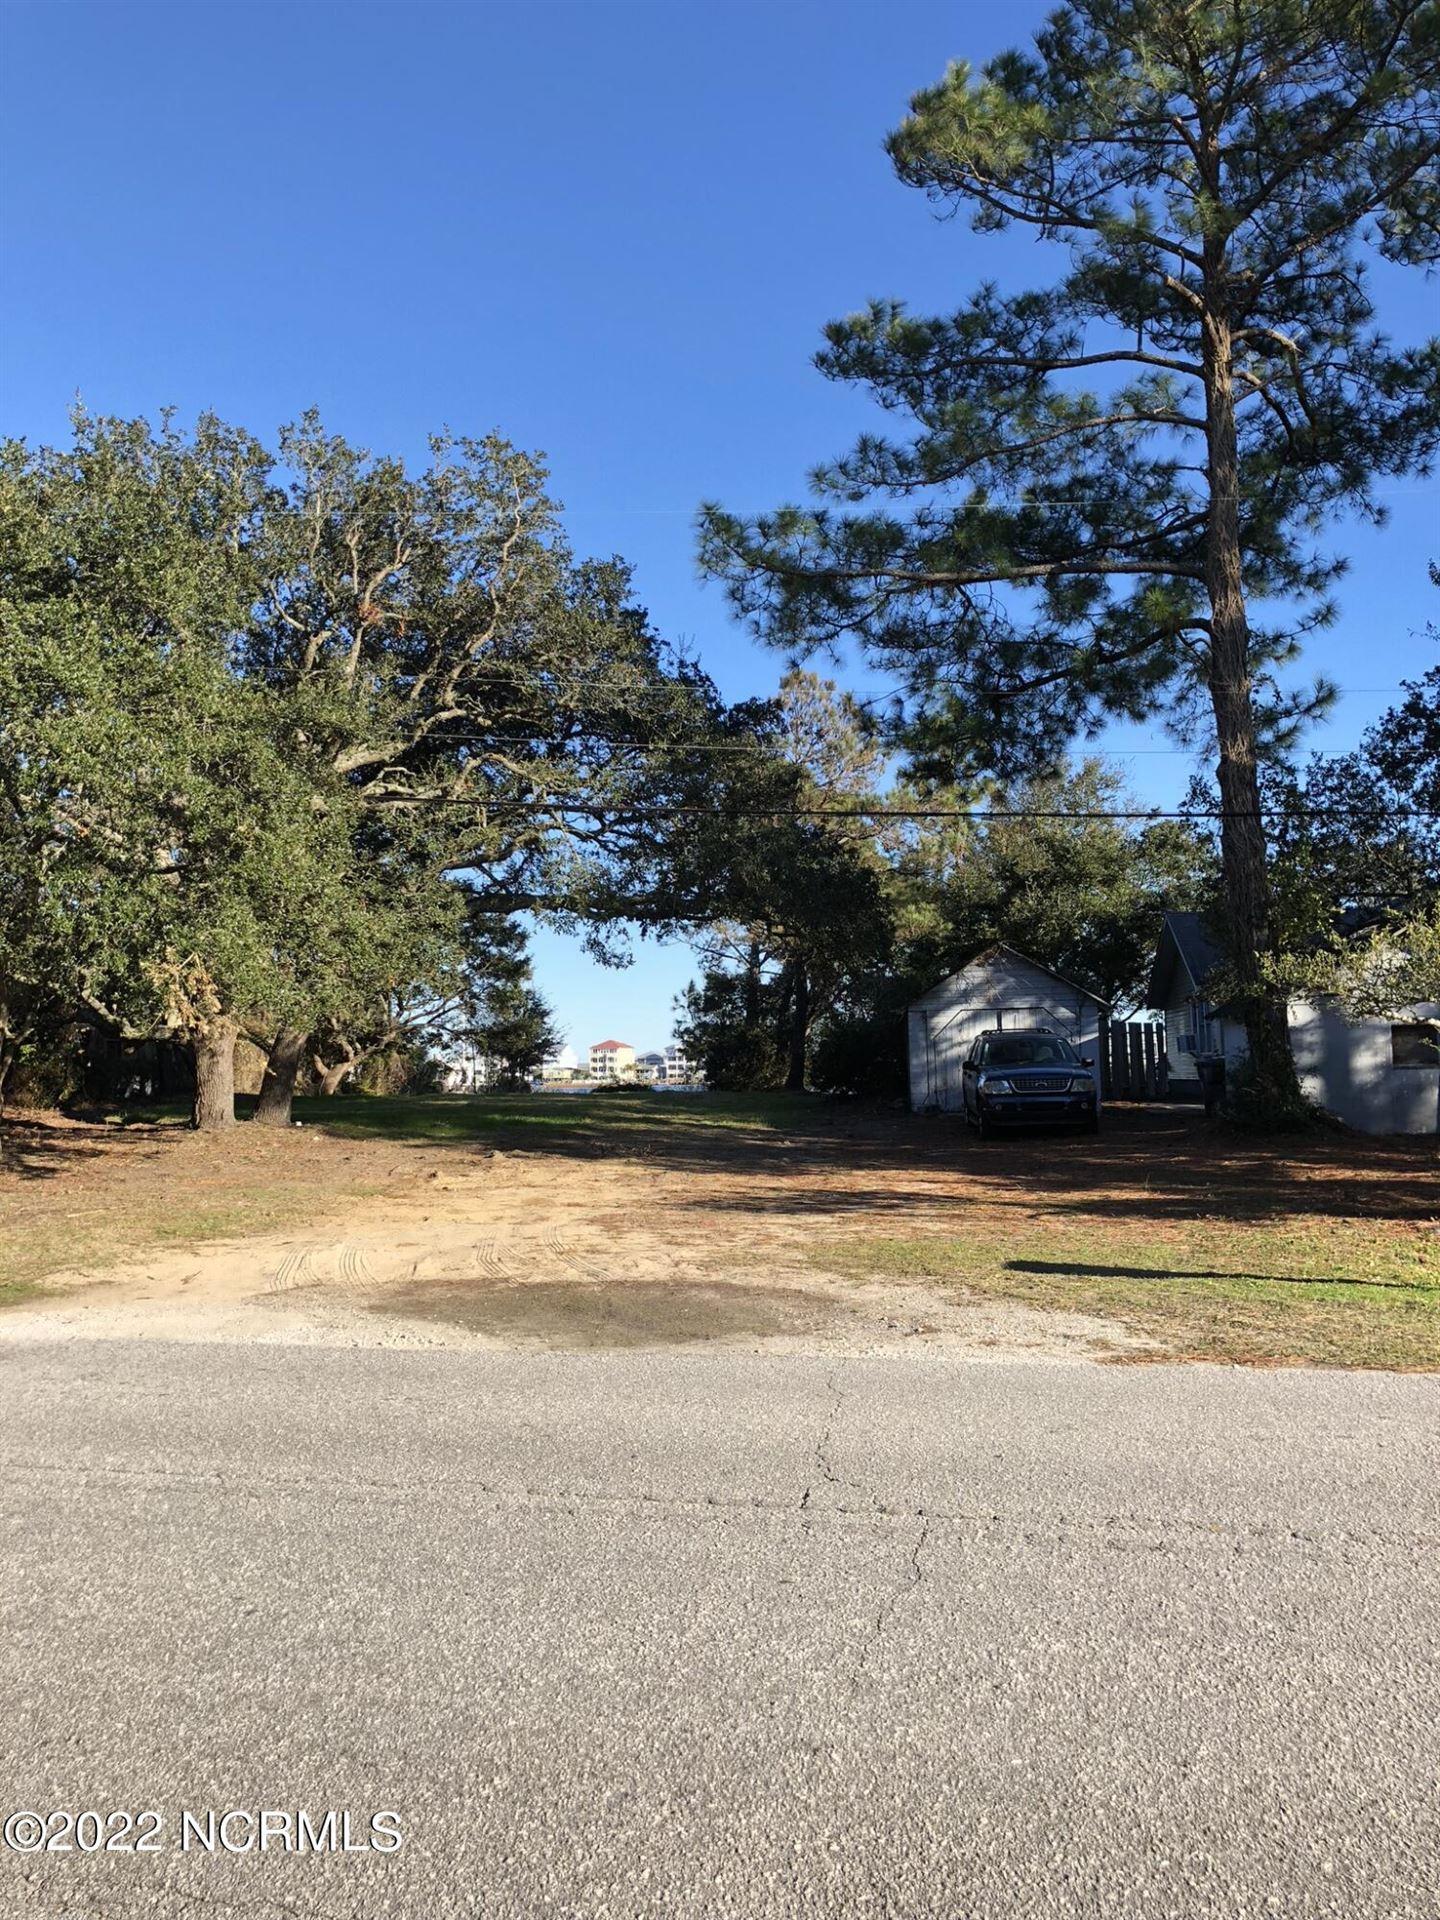 Photo for 1326 Saint Joseph Street, Carolina Beach, NC 28428 (MLS # 100224130)